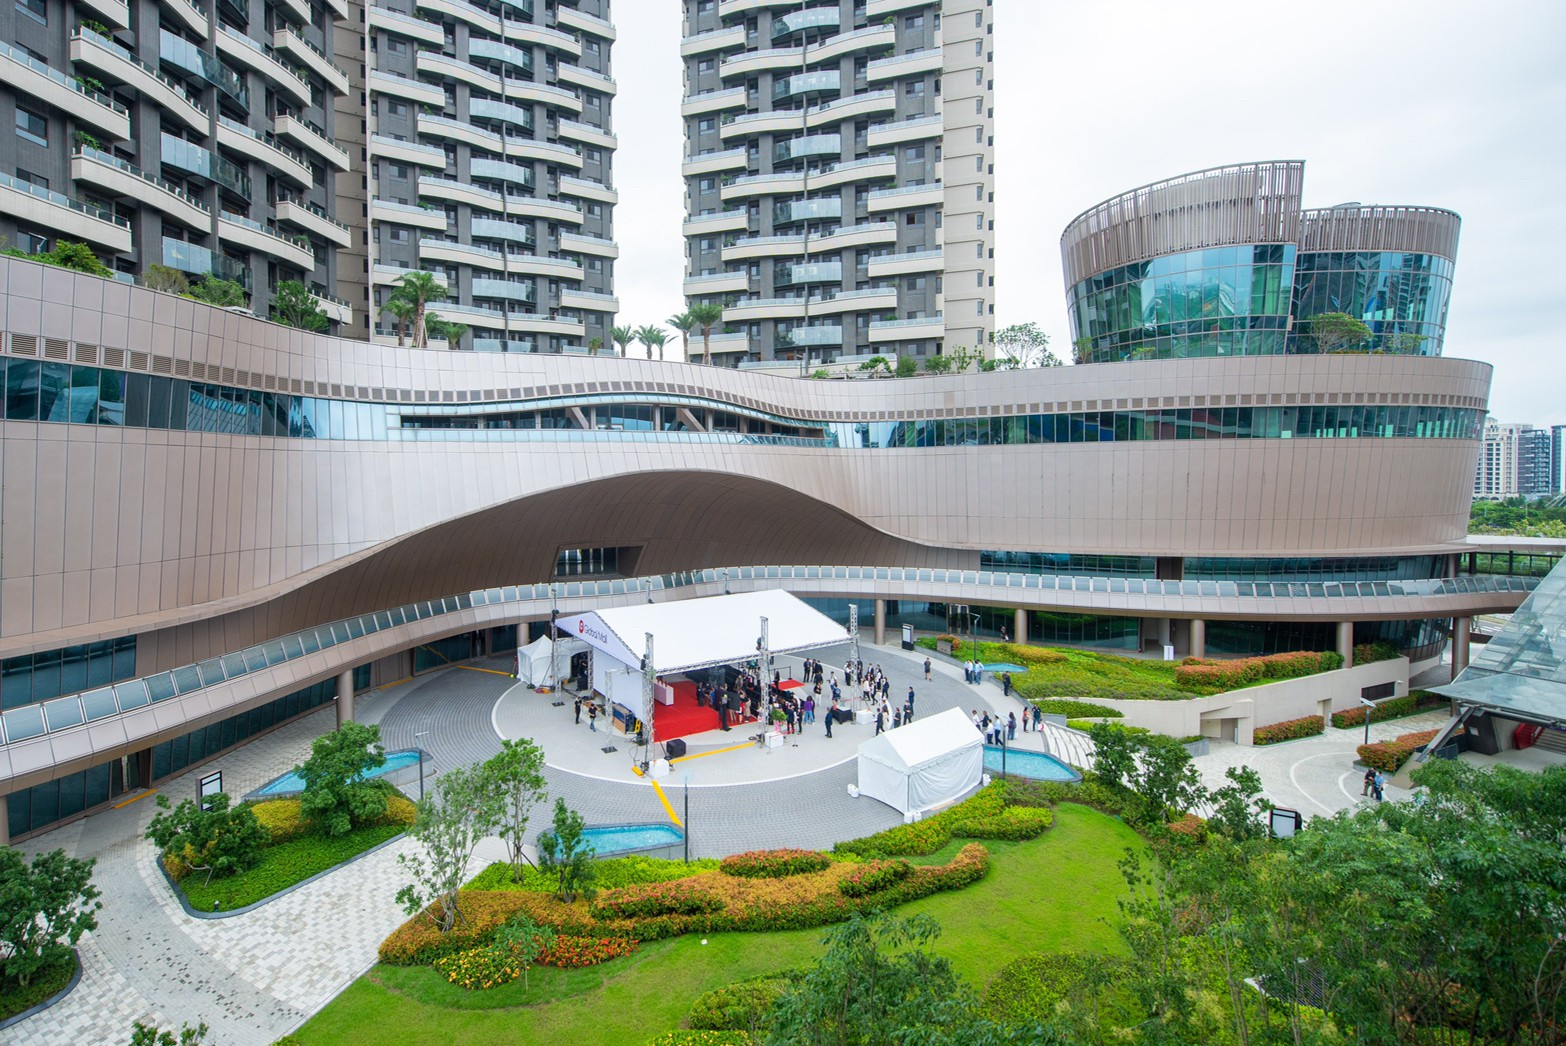 Global Mall桃園A19力拚明年球季前開幕,增進青埔地區生活機能及商業發展